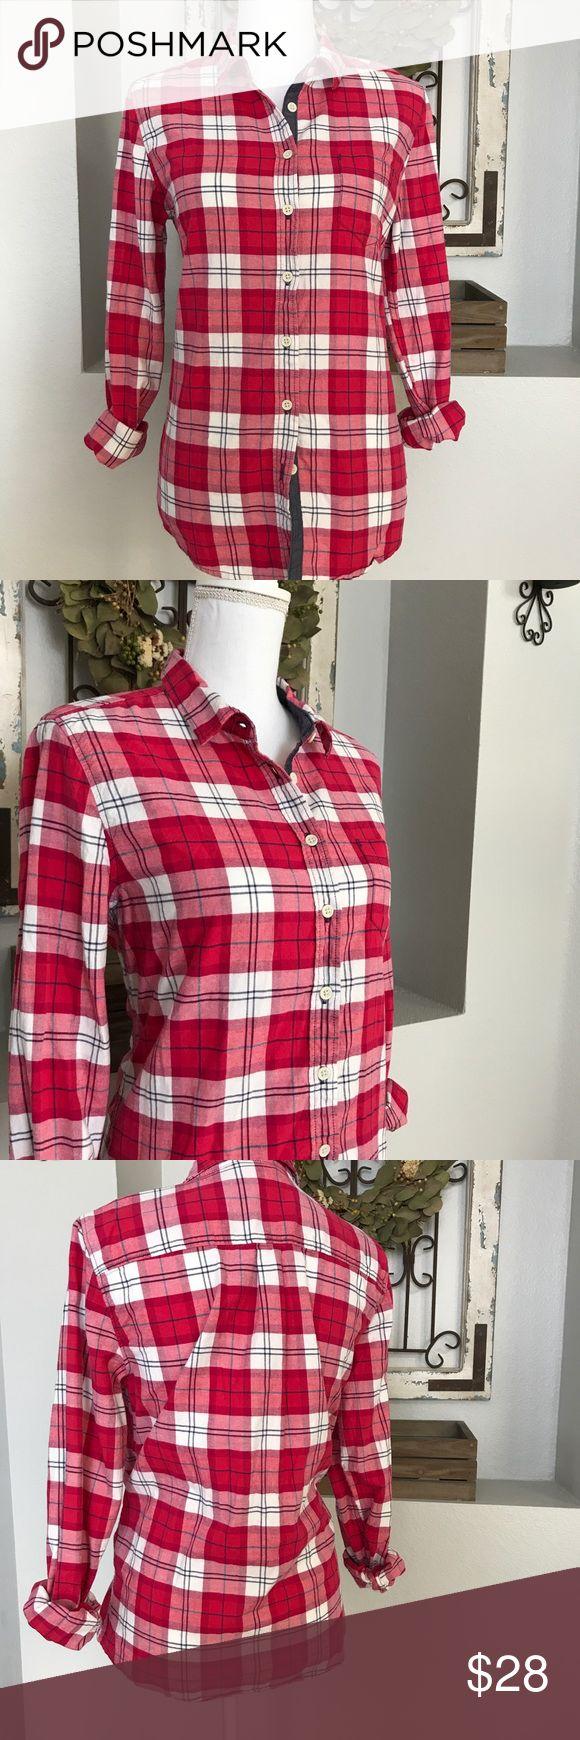 Joe Fresh Pink Plaid Flannel Button Down Joe Fresh Pink Plaid Flannel Button Down - Size medium. Joe Fresh Tops Button Down Shirts